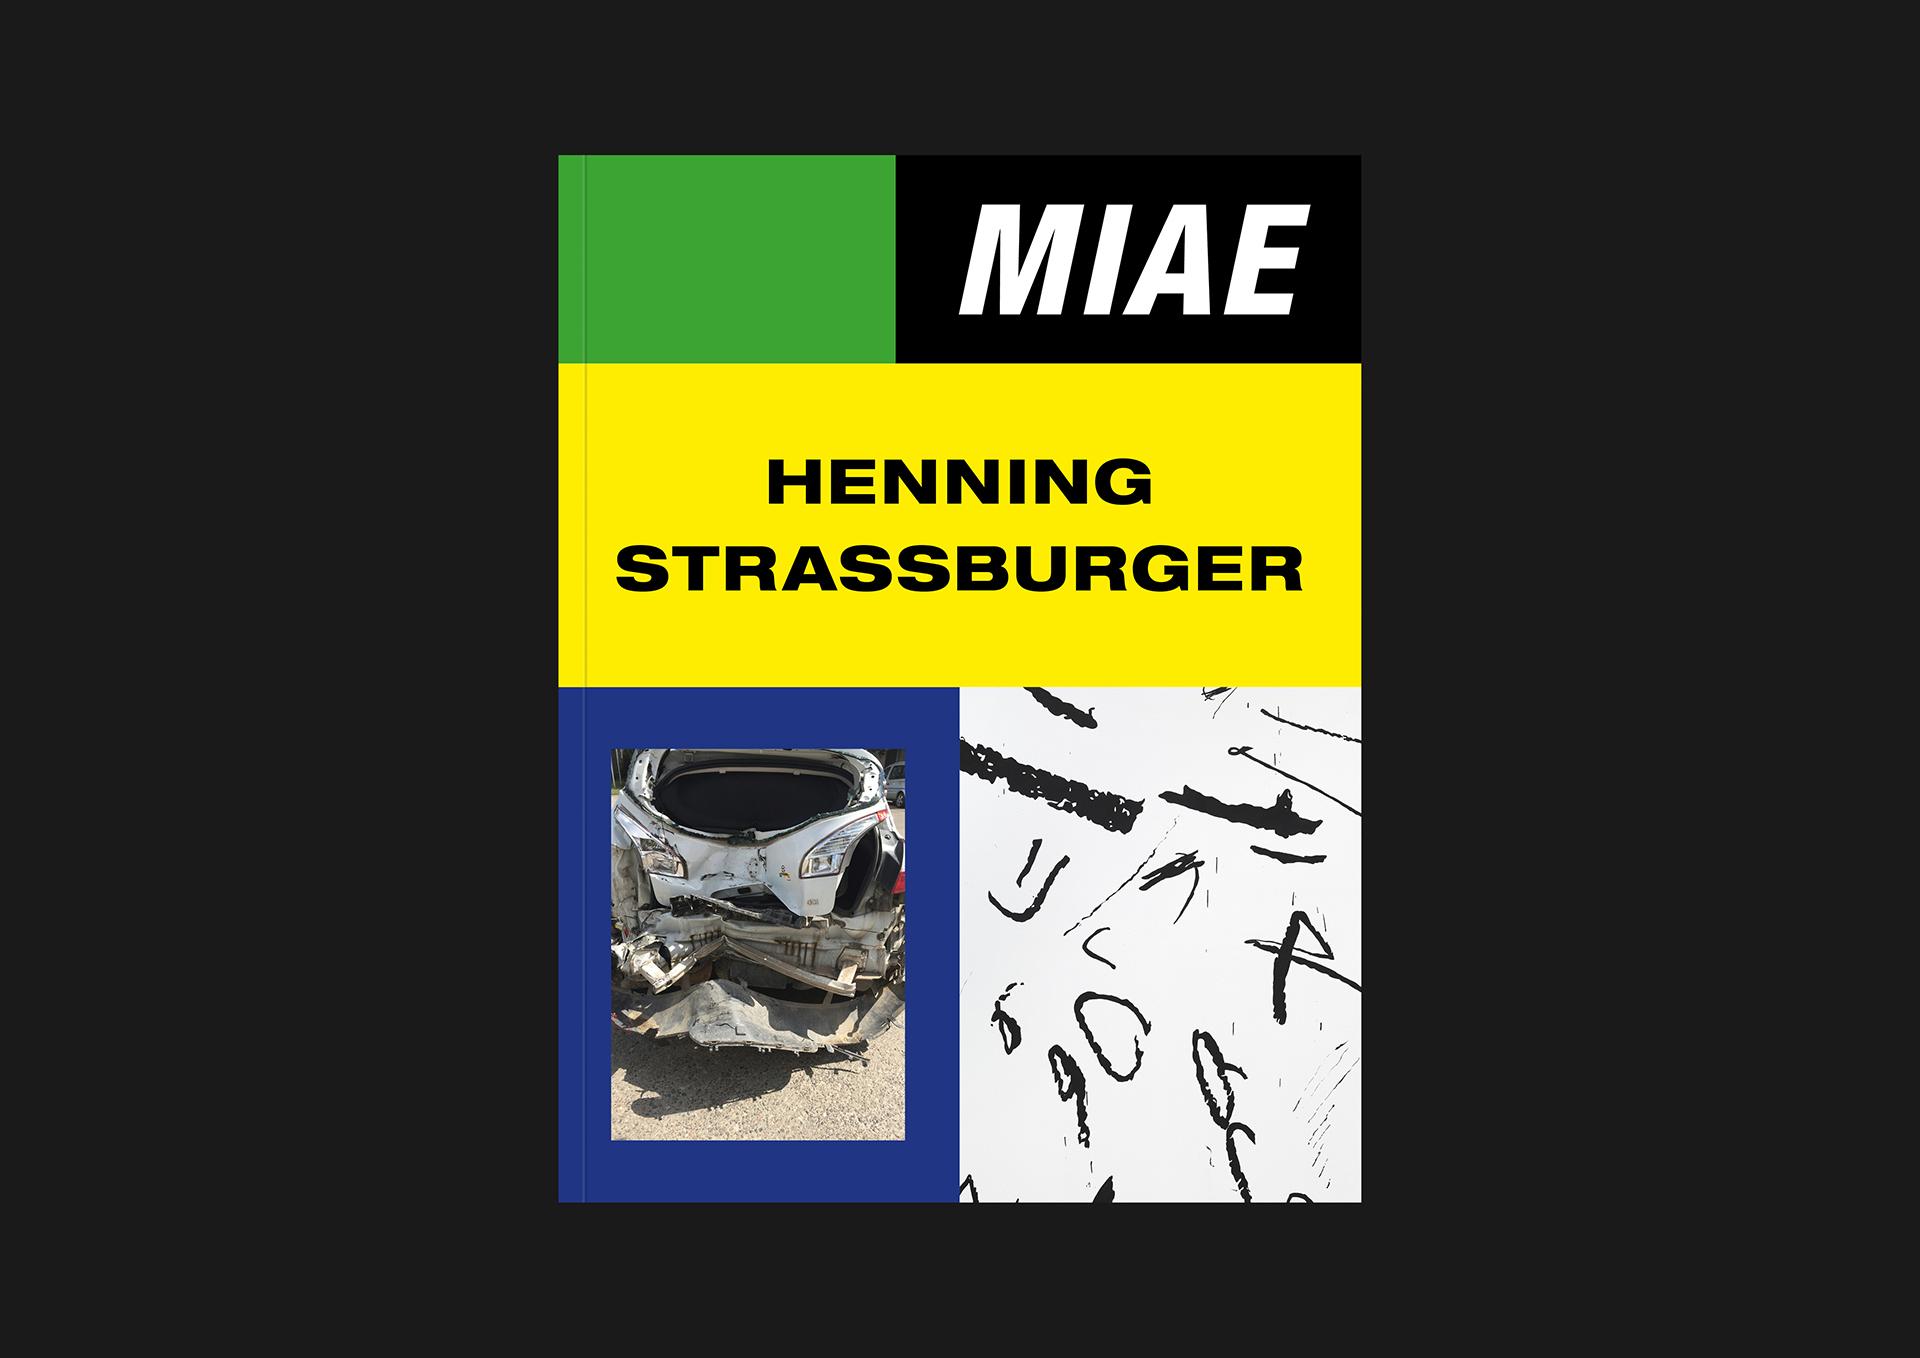 SMS_HS_MIAE_1